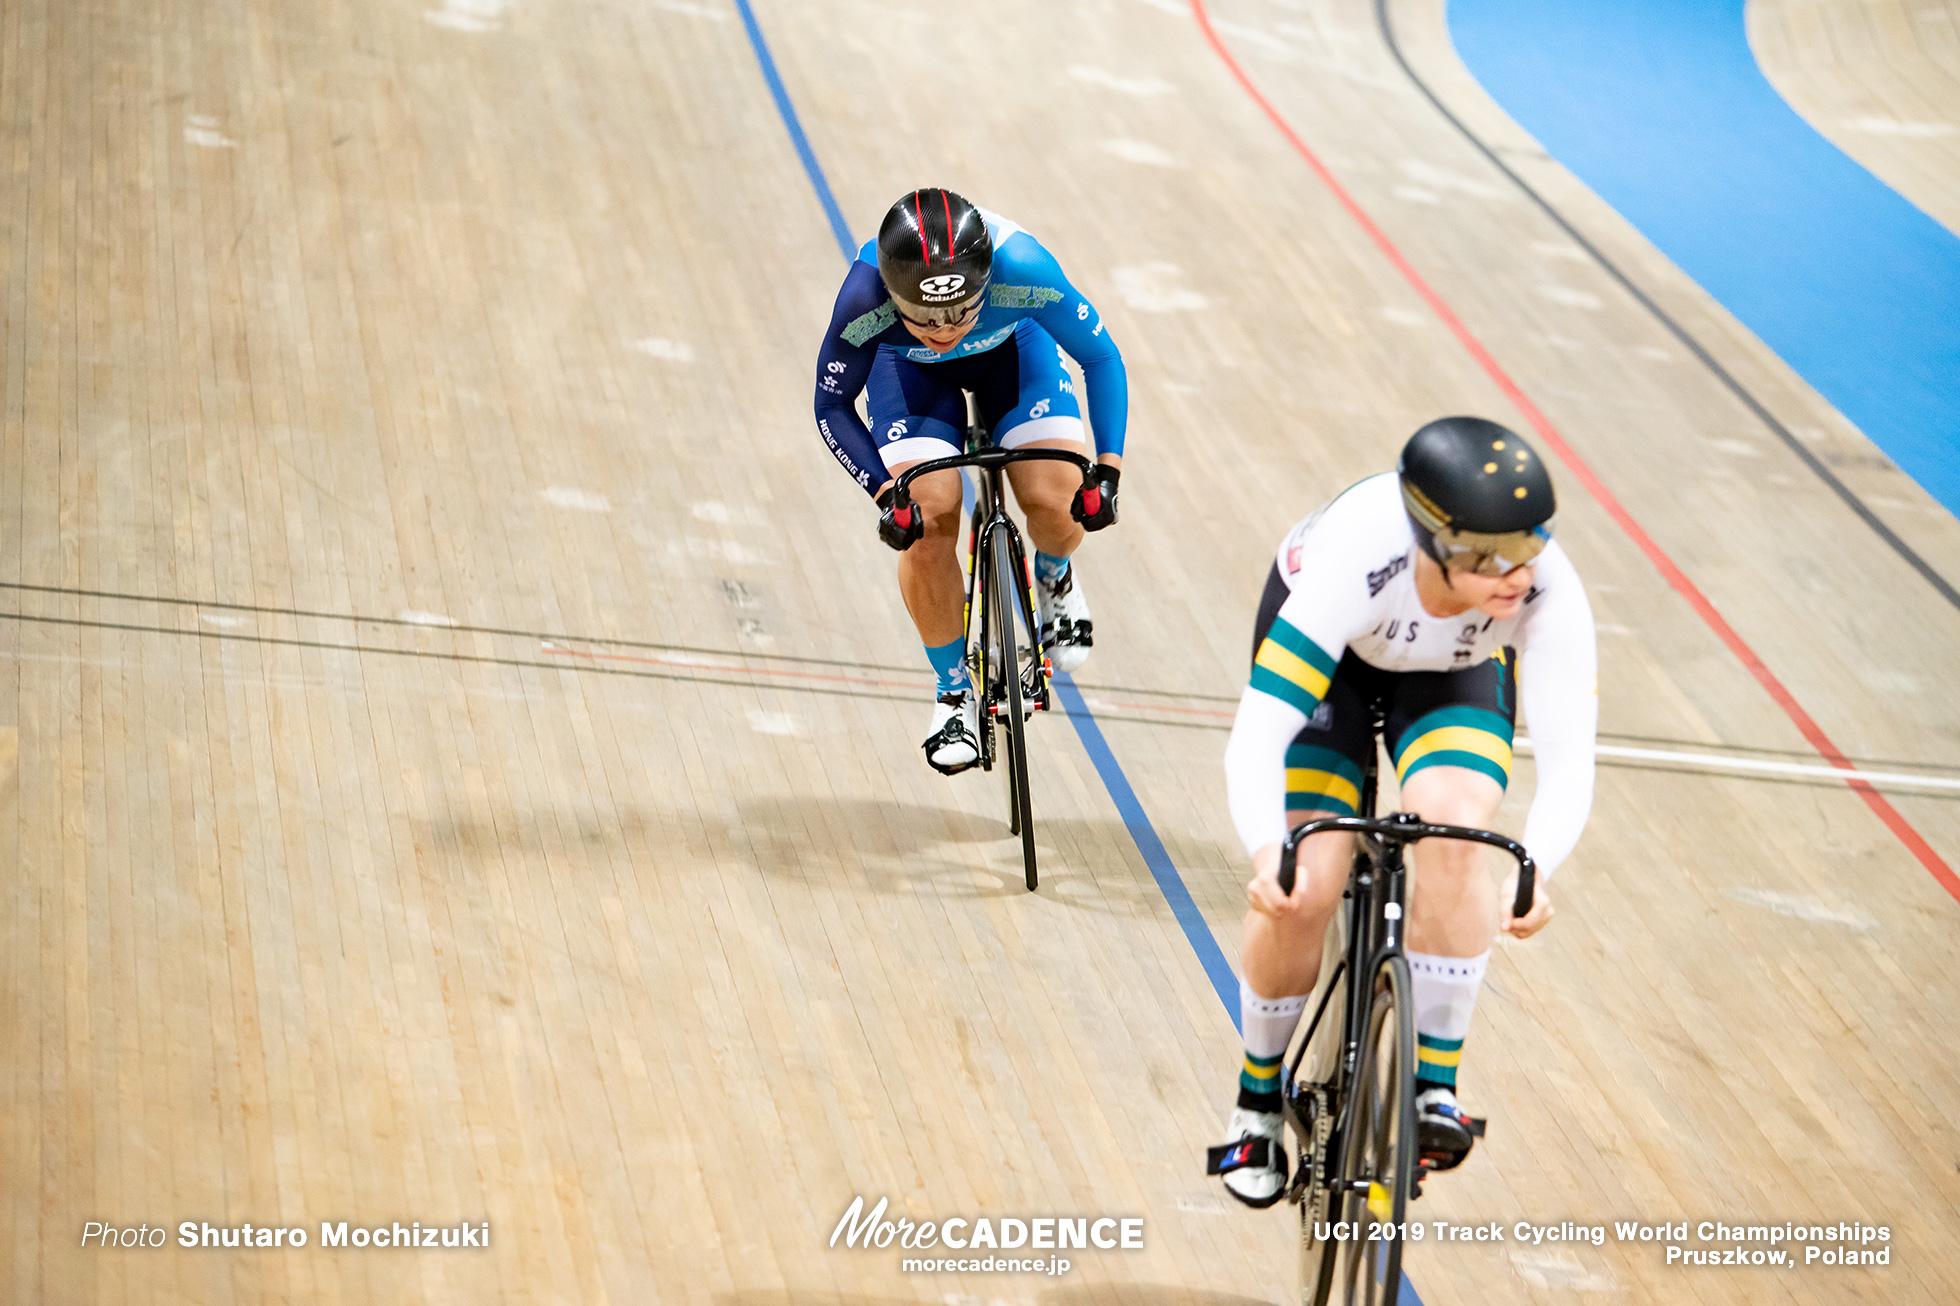 Women's Sprint Final / 2019 Track Cycling World Championships Pruszków, Poland